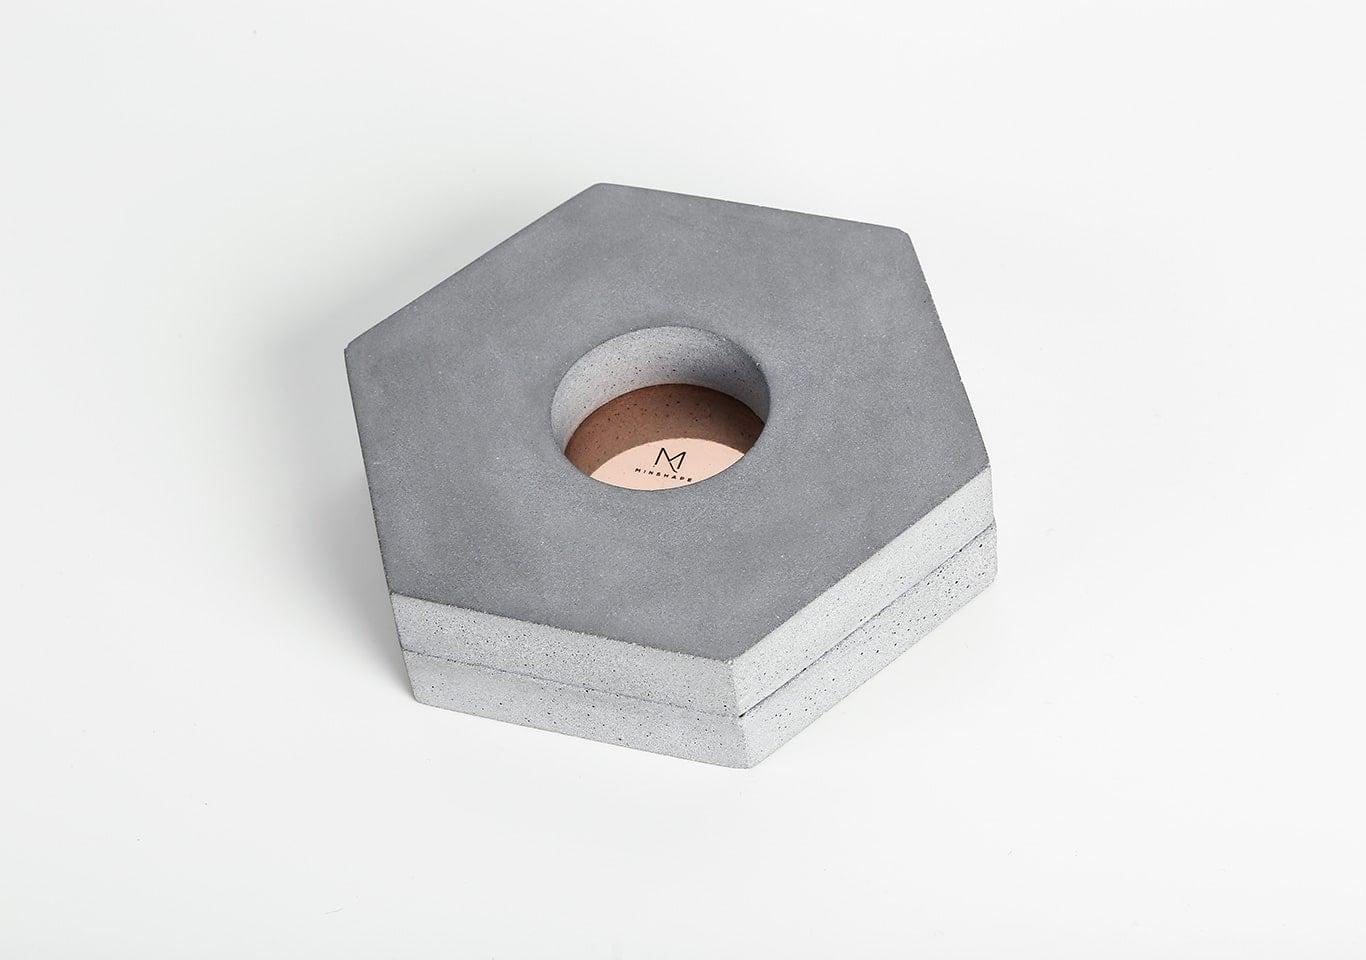 Handmade Concrete Home Accessories